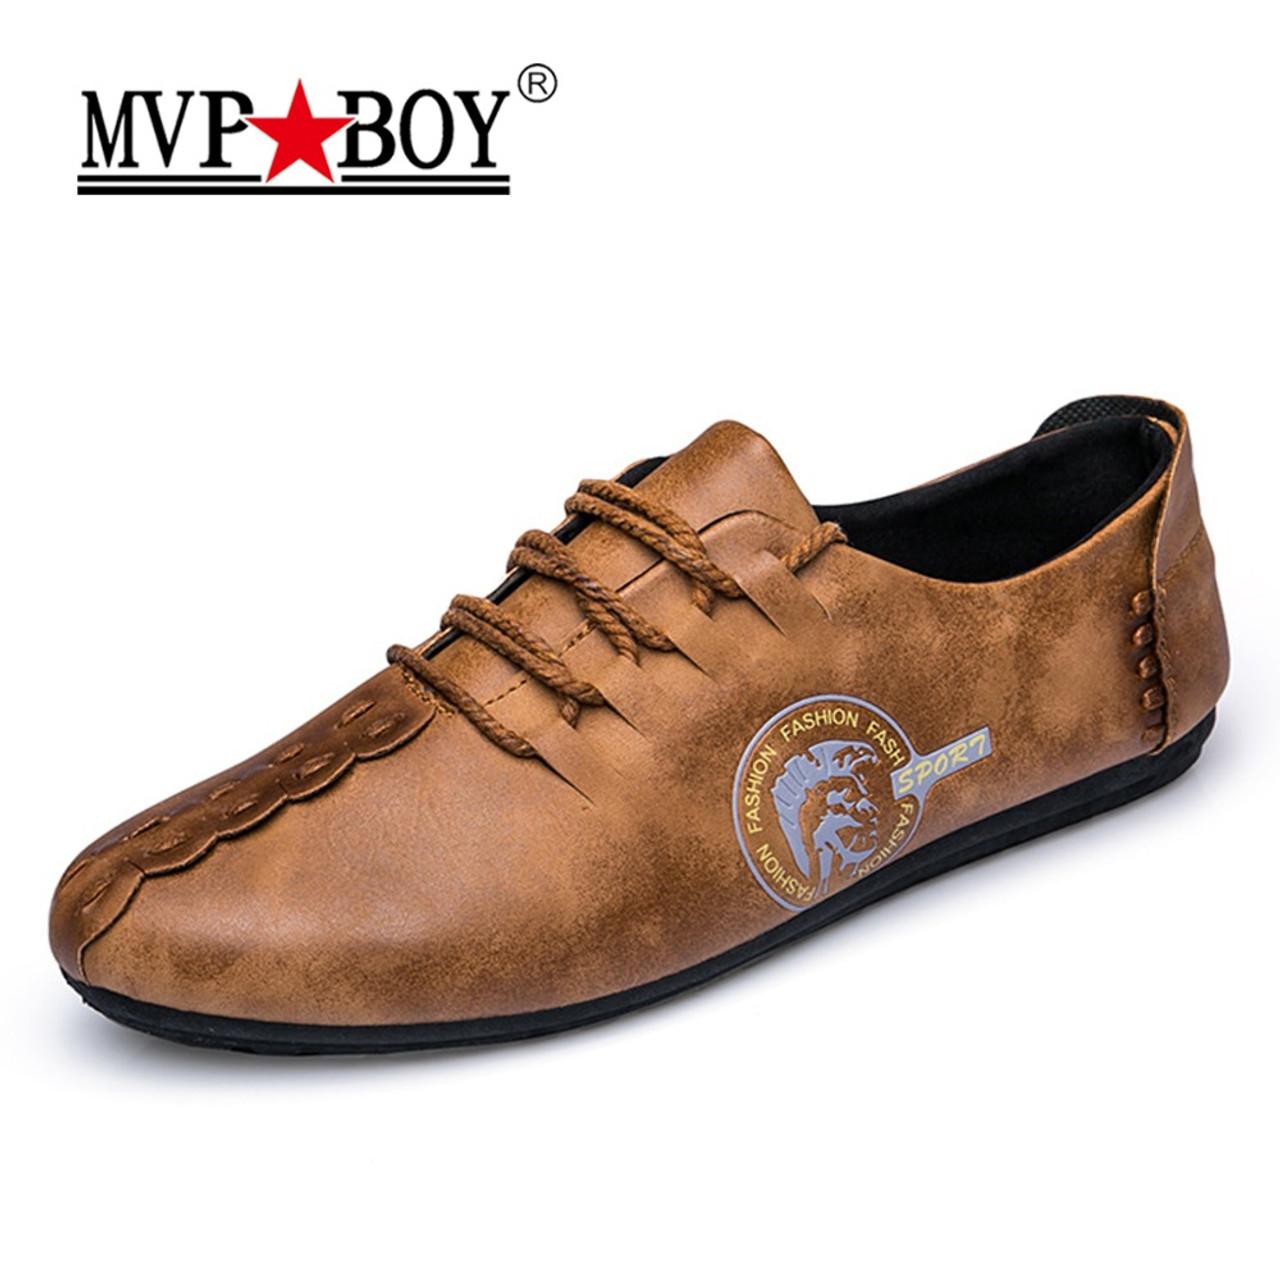 MVP BOY 2018 New Comfortable Casual Shoes Loafers Men Shoes Quality Split  Leather Shoes Men Flats ... 8d491c417f5b